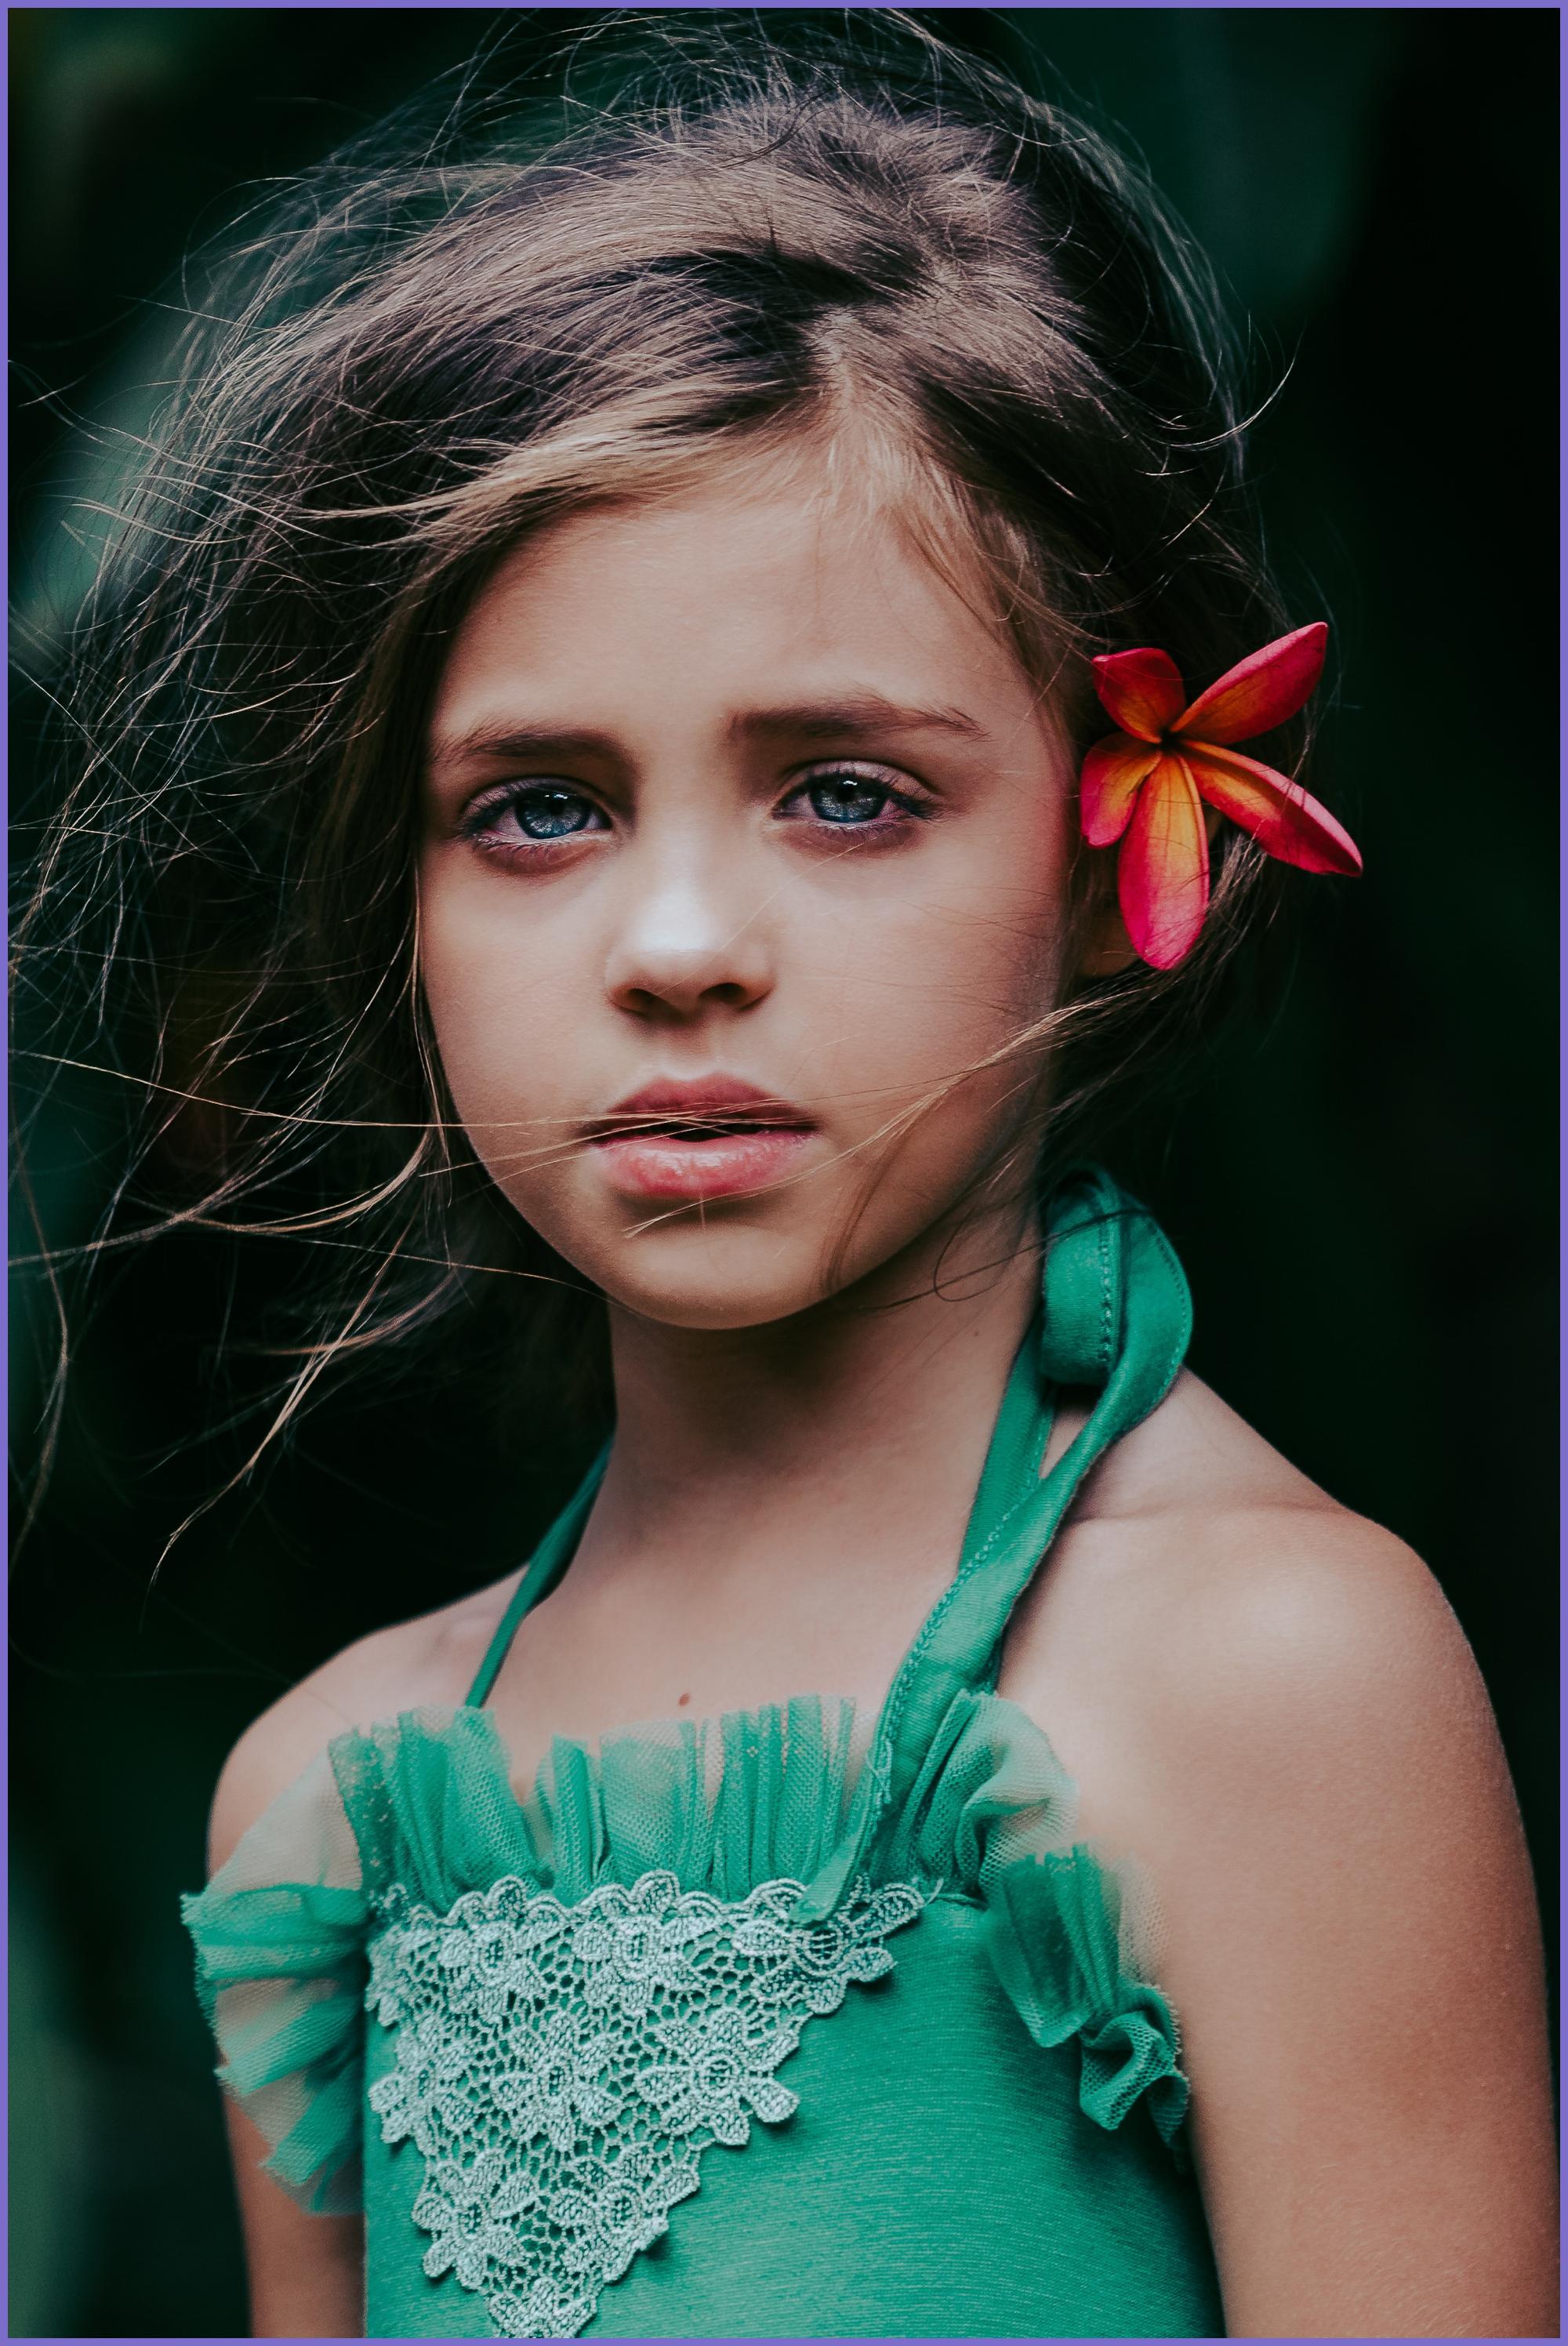 Girl model with flower - Honolulu Children photographer - Ketino Photography.jpg